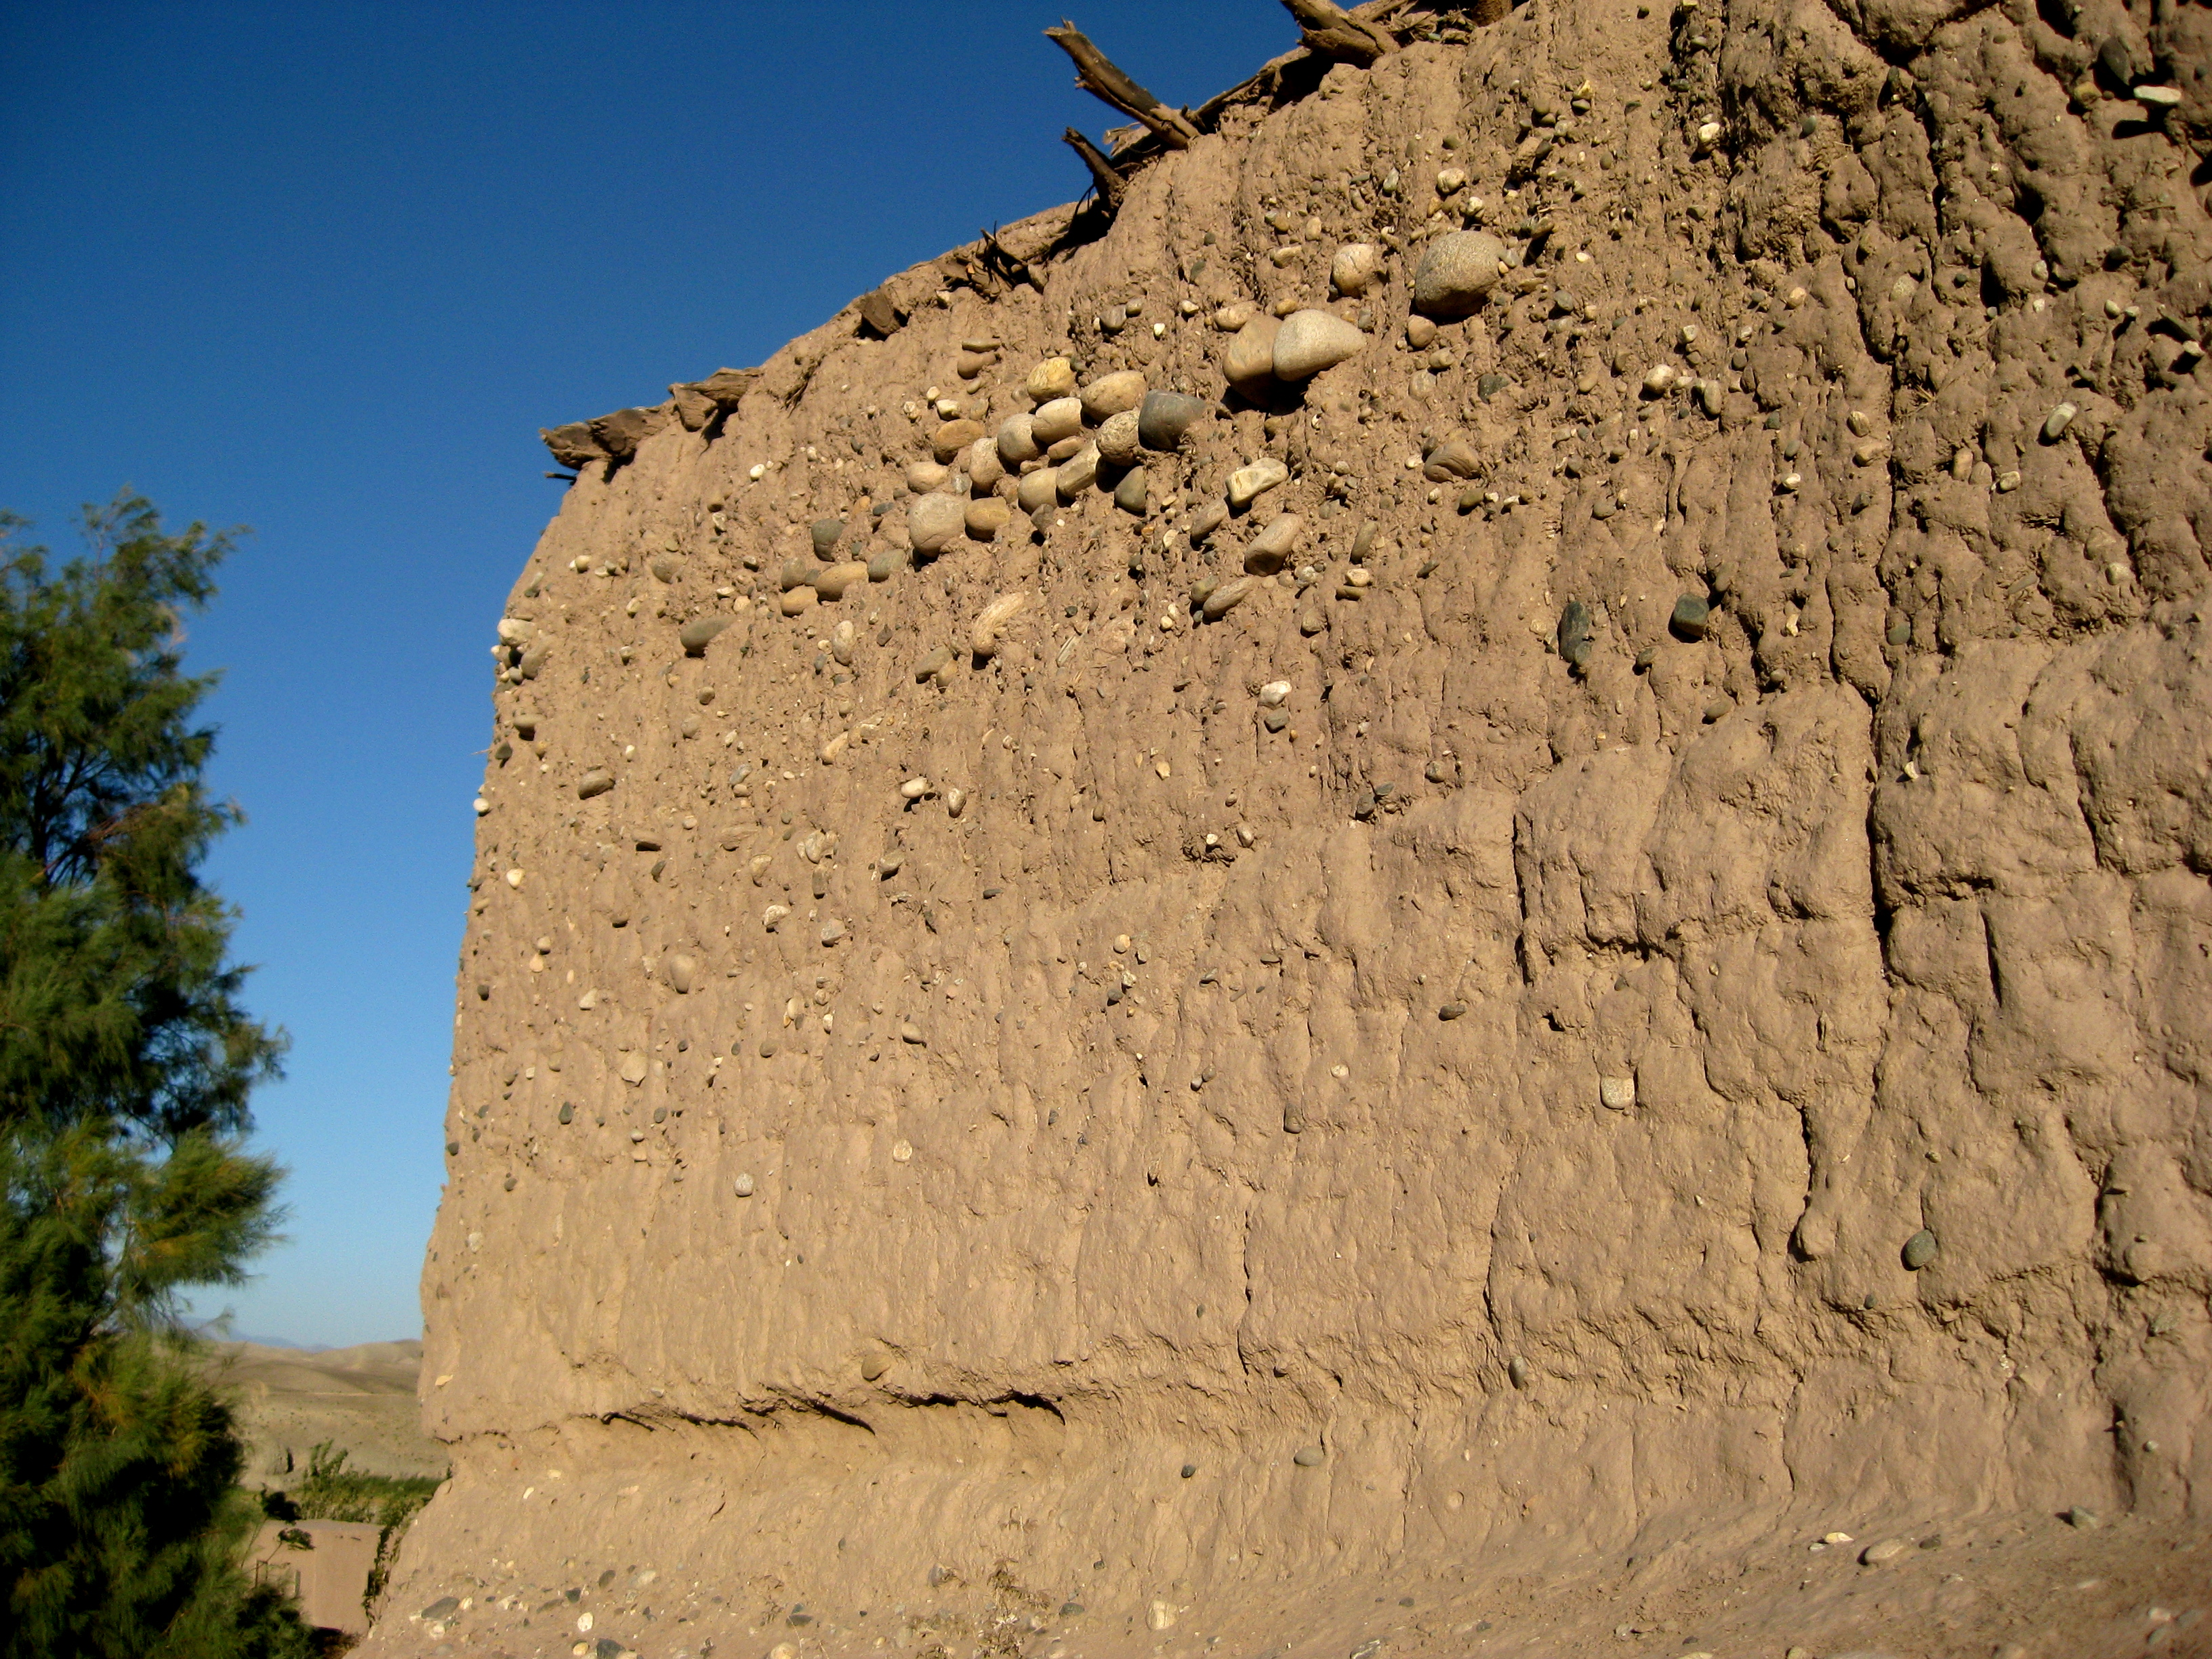 Building A Mud Wall